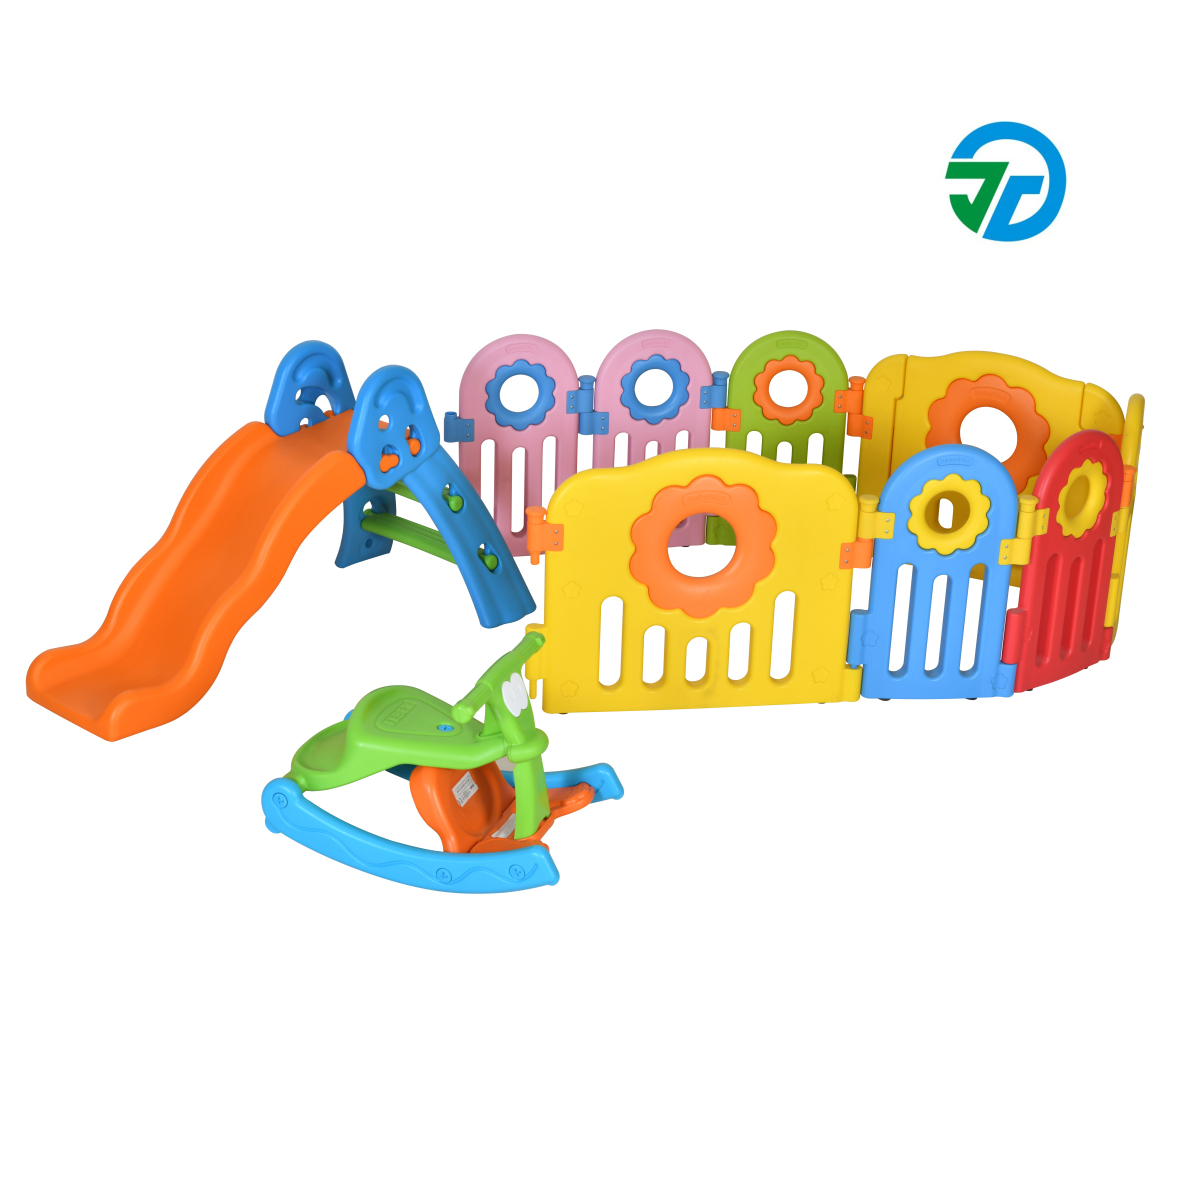 Plastic indoor toy